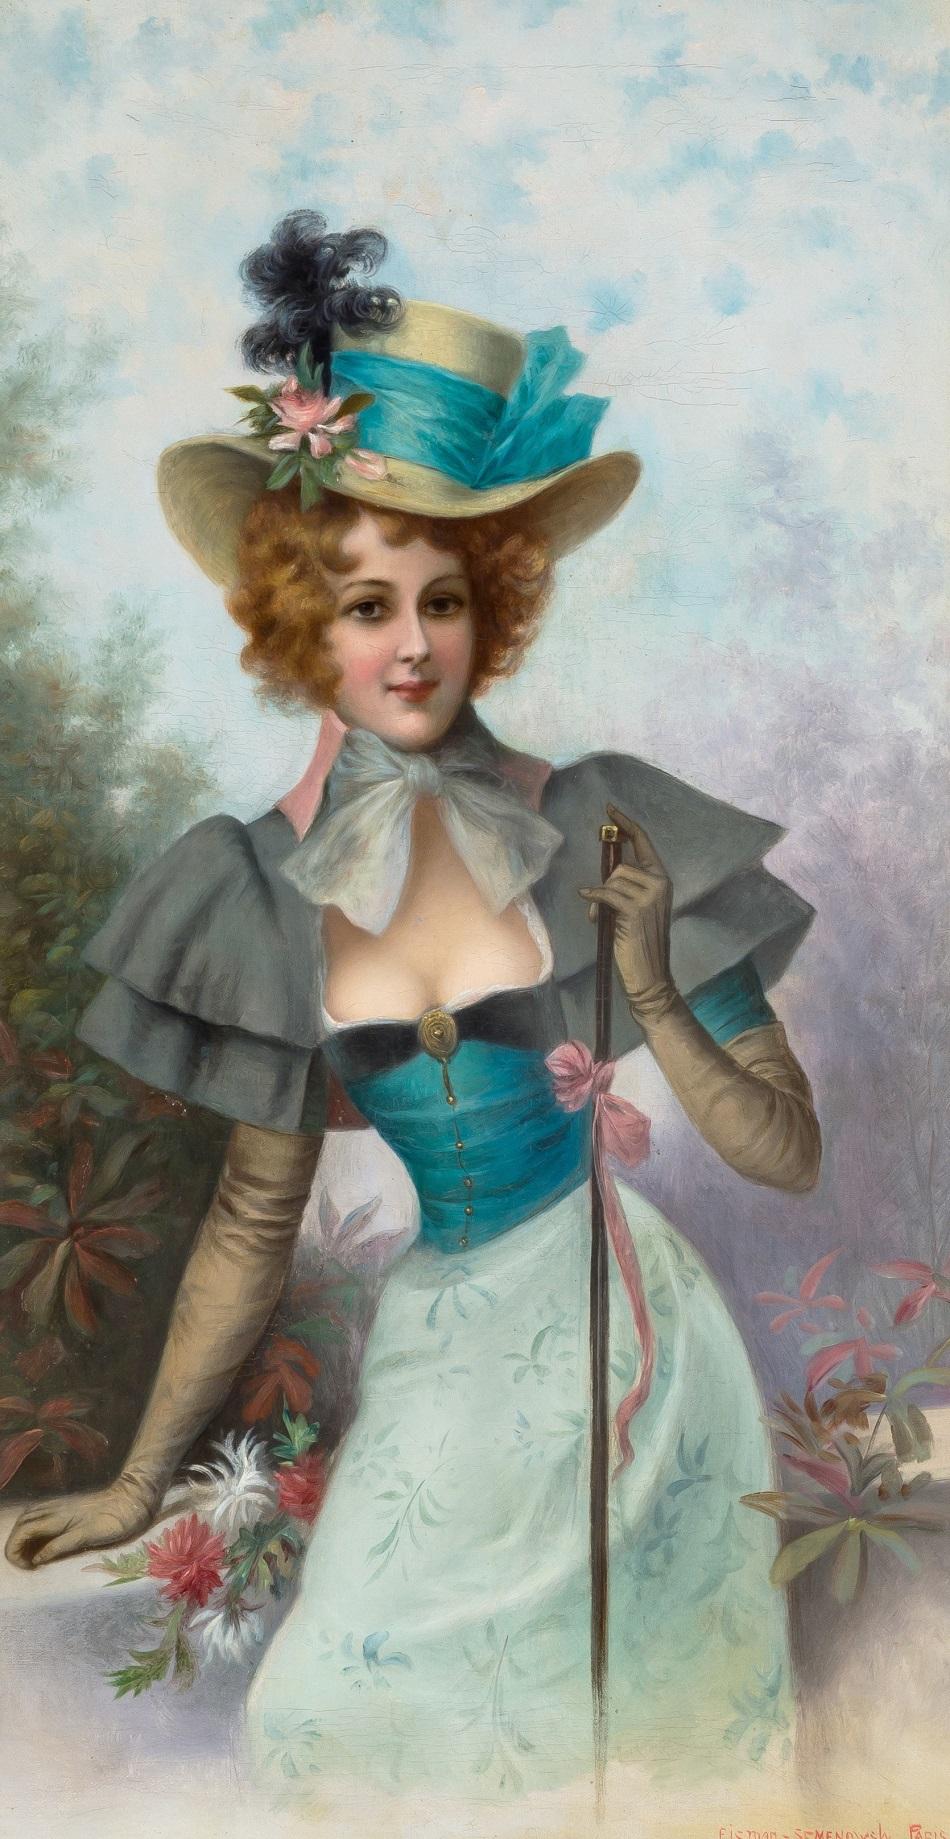 EMILE EISMAN-SEMENOWSKY (POLISH-FRENCH 1857-1911)The Dandizette..jpg